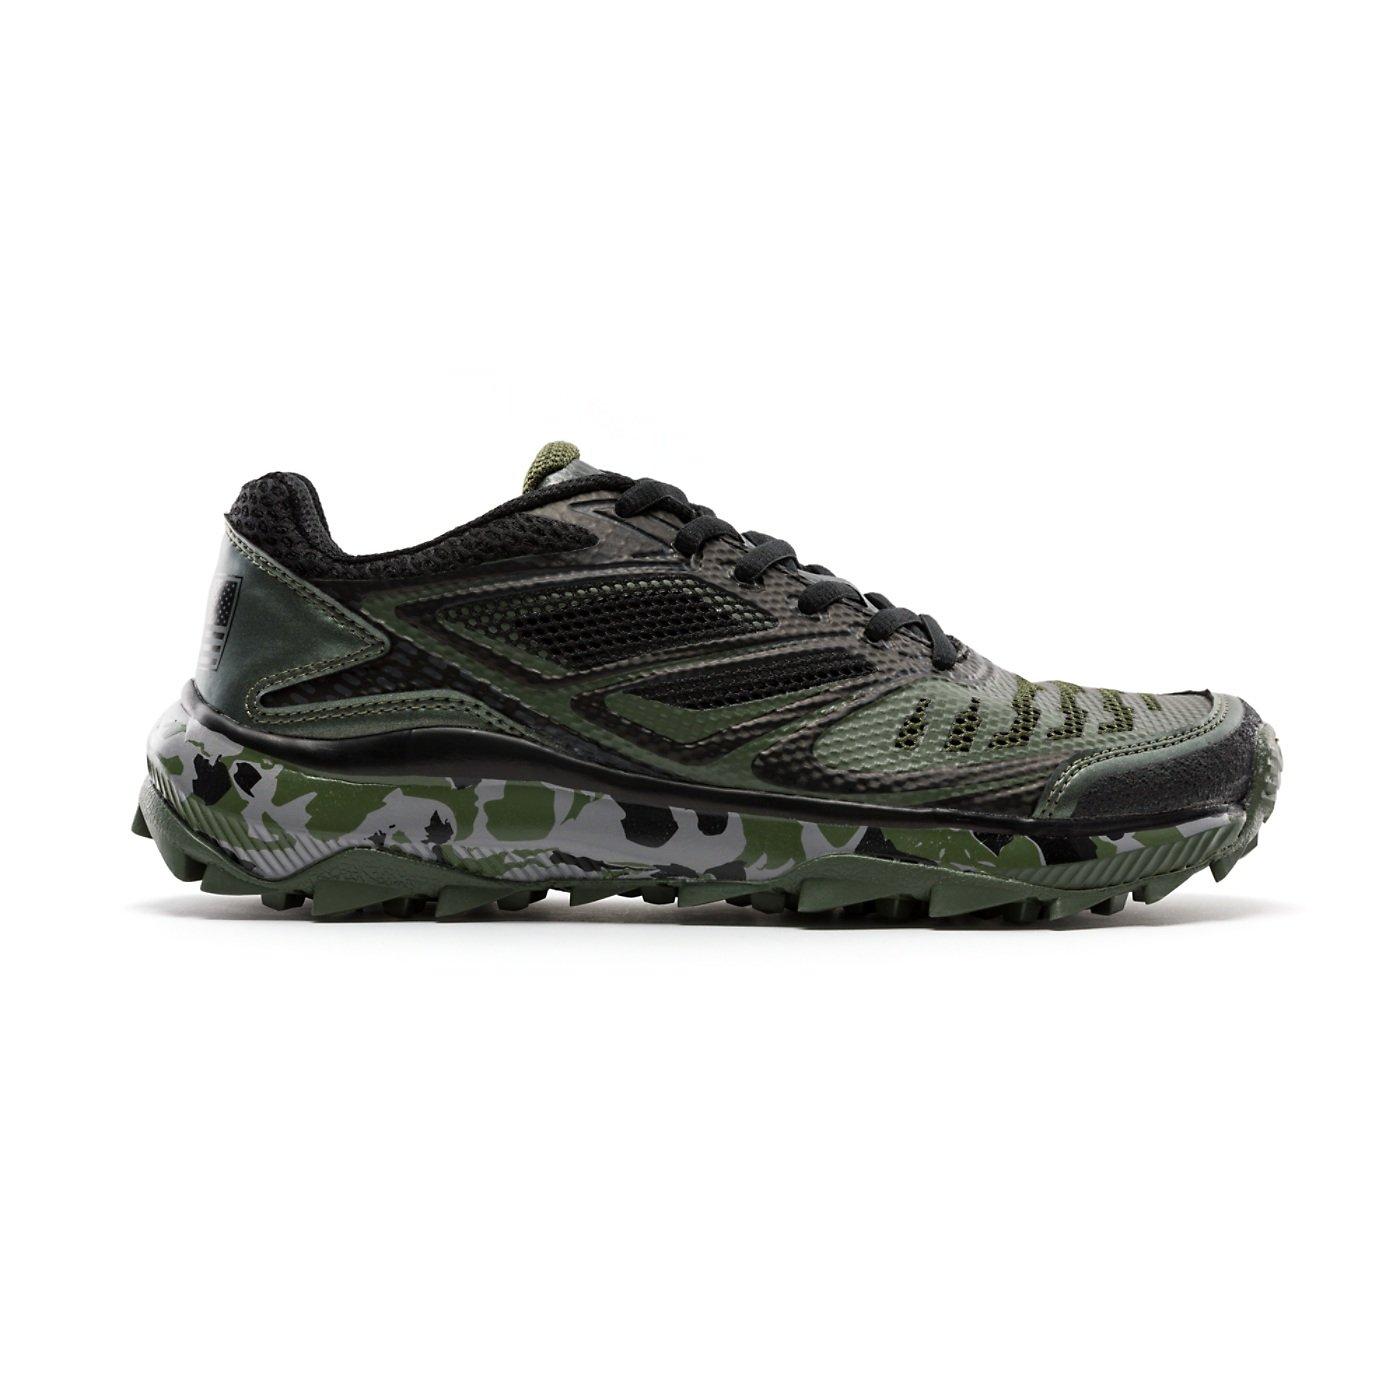 BoombahメンズTurbine Turf Shoes – 20カラーオプション – 複数のサイズ B07C9RHJLH 12|ブラック/オリーブ ブラック/オリーブ 12